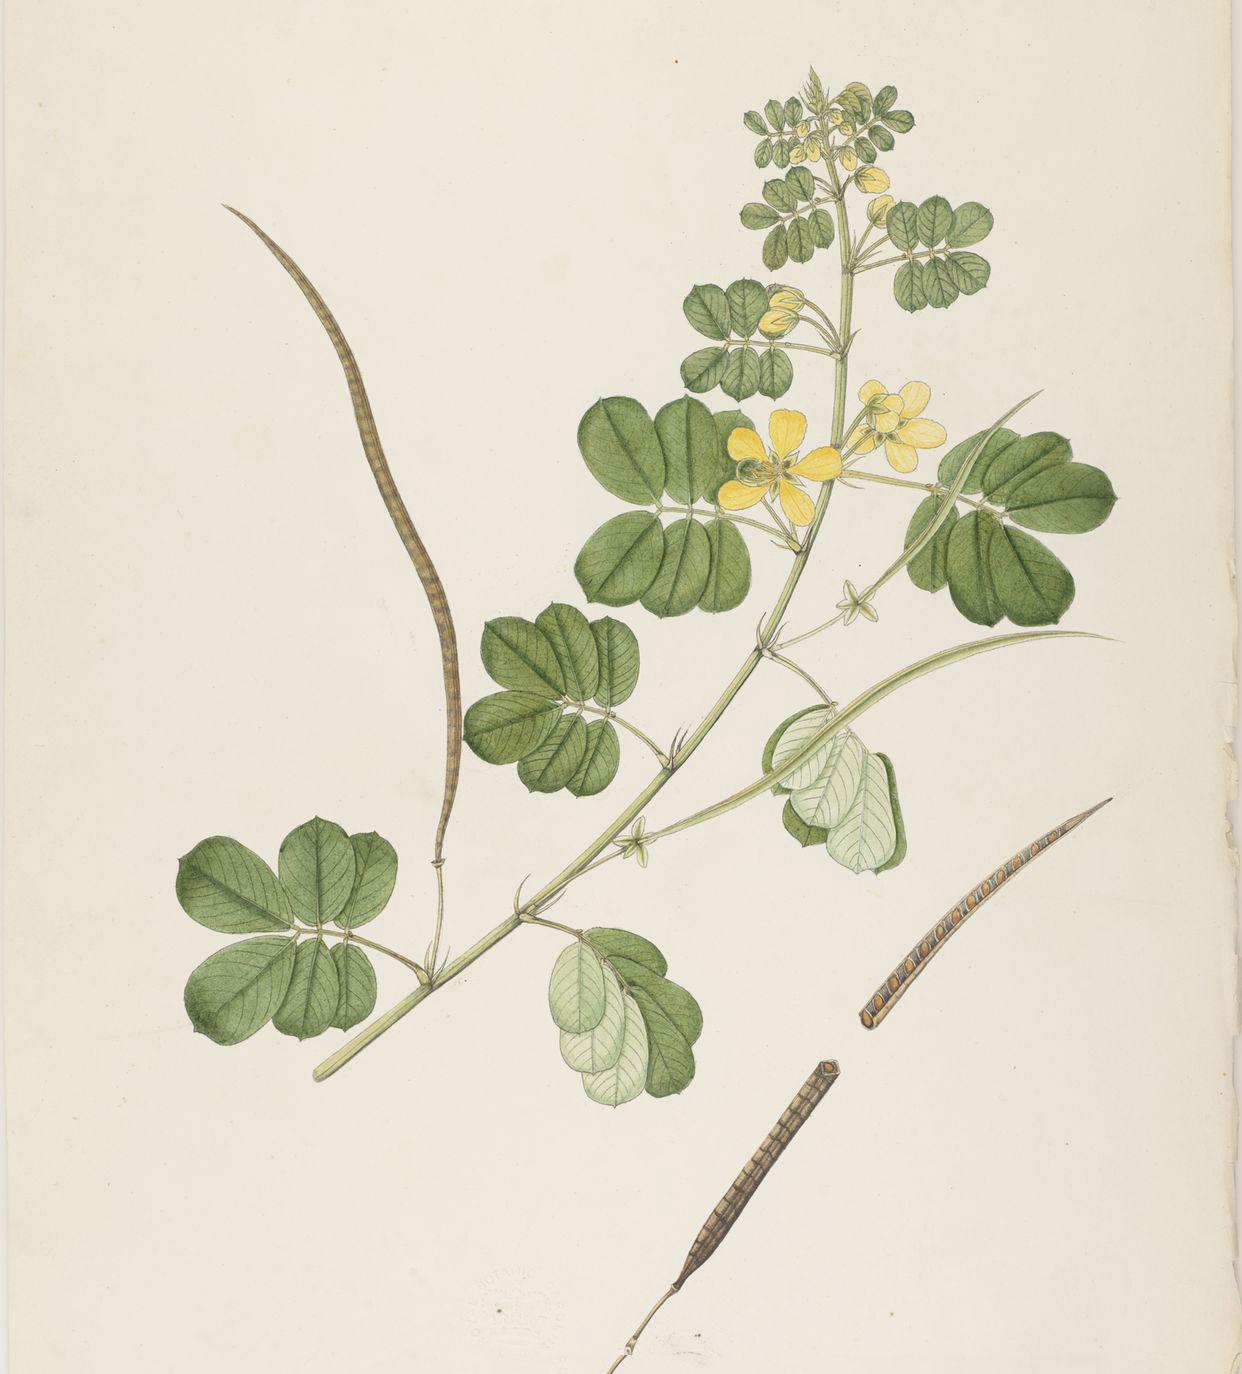 Plant-Illustration-of-Sicklepod